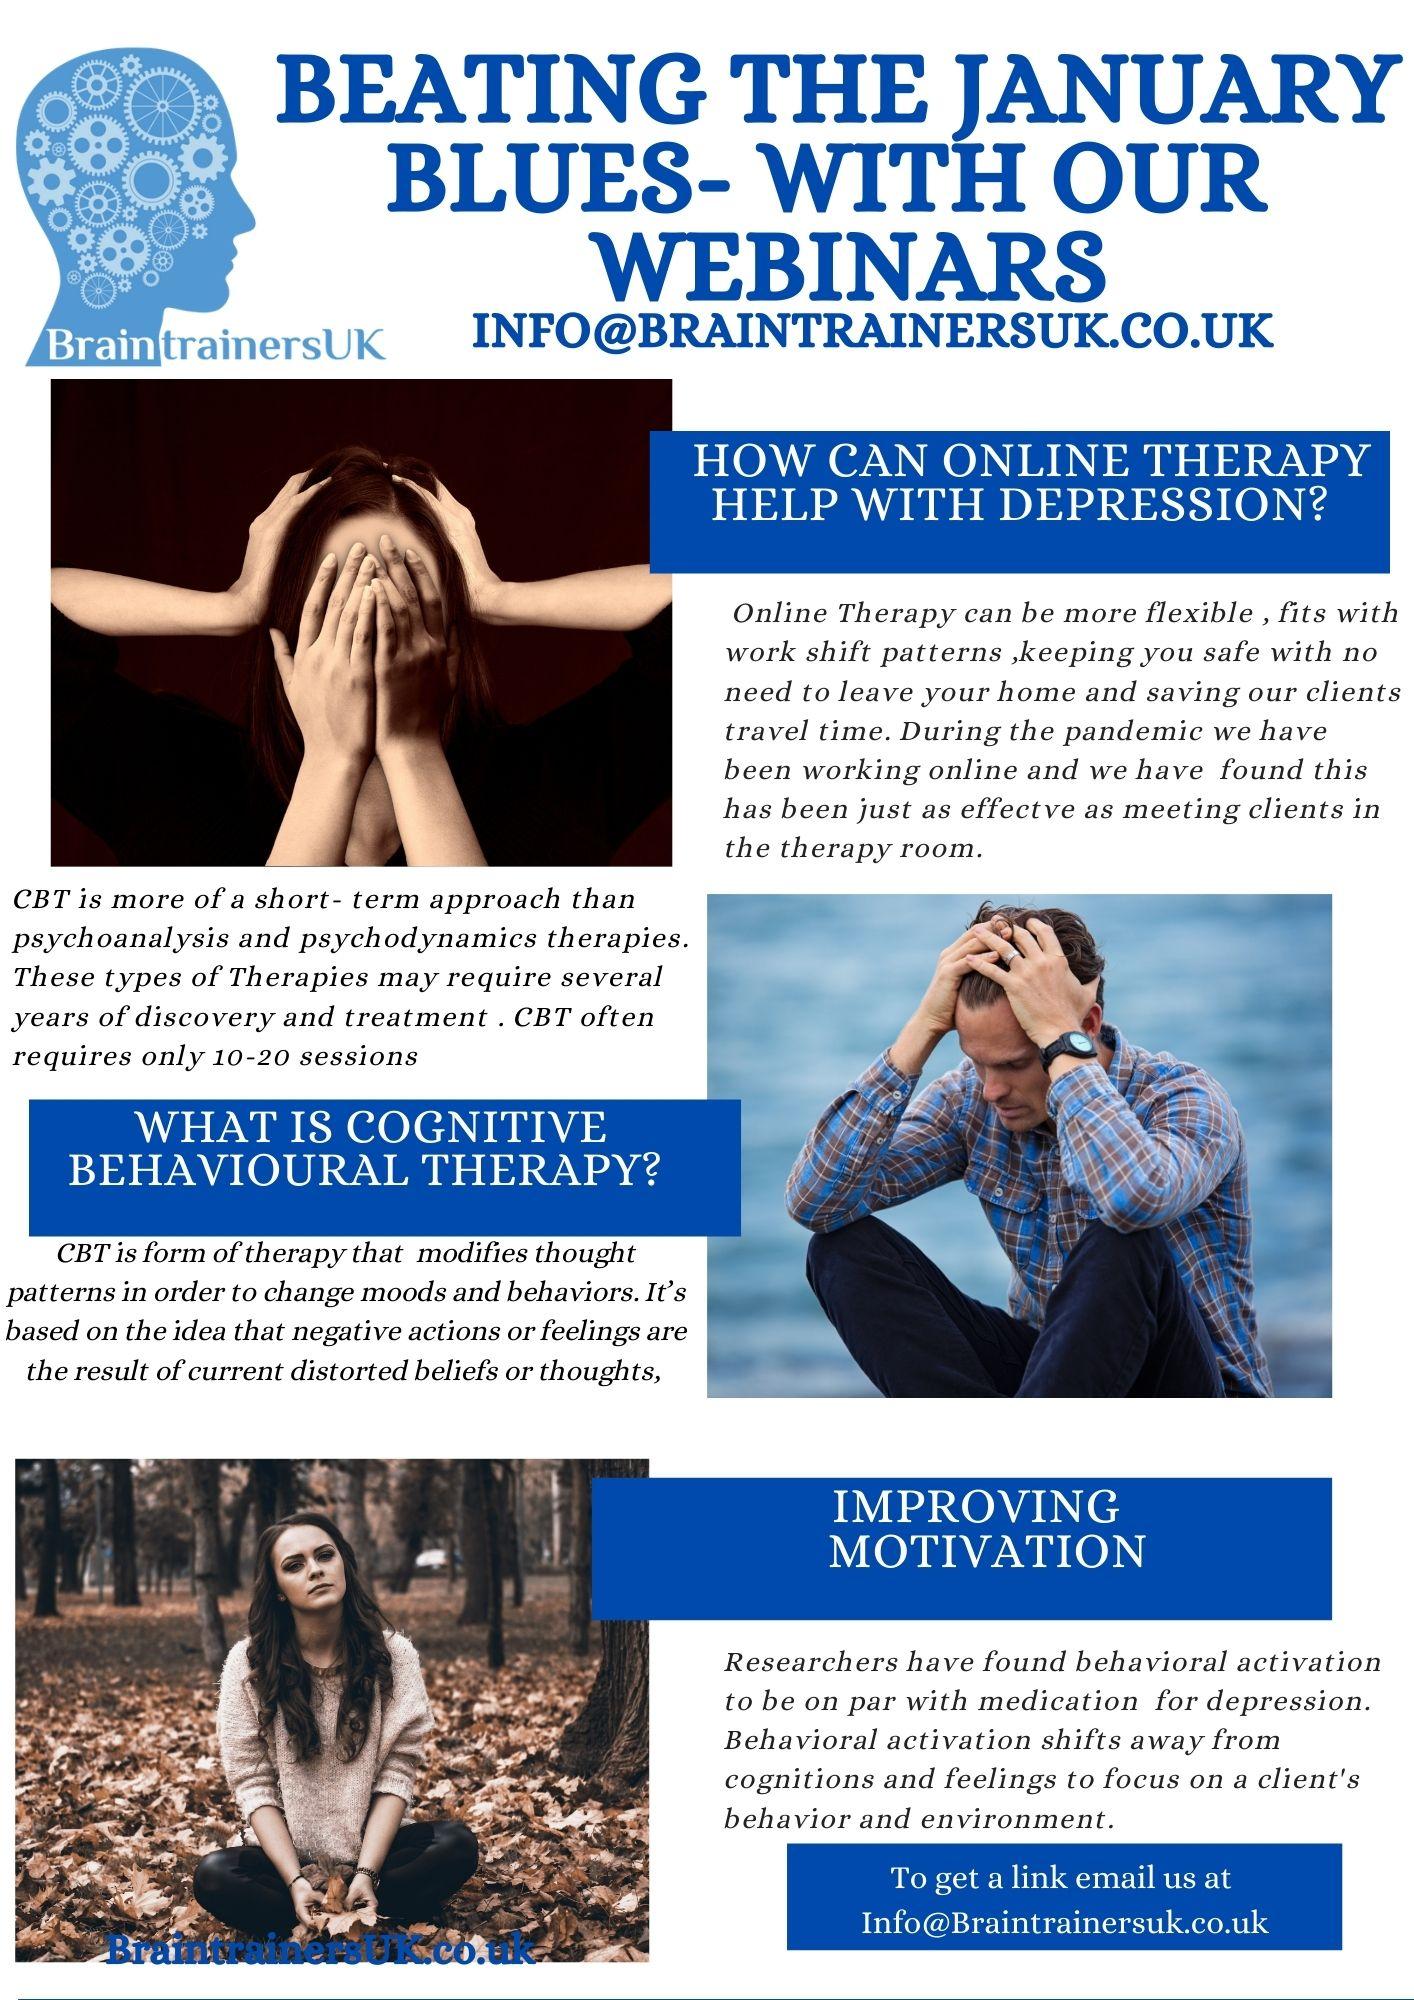 BrainTrainersUK Mental Health Professionals